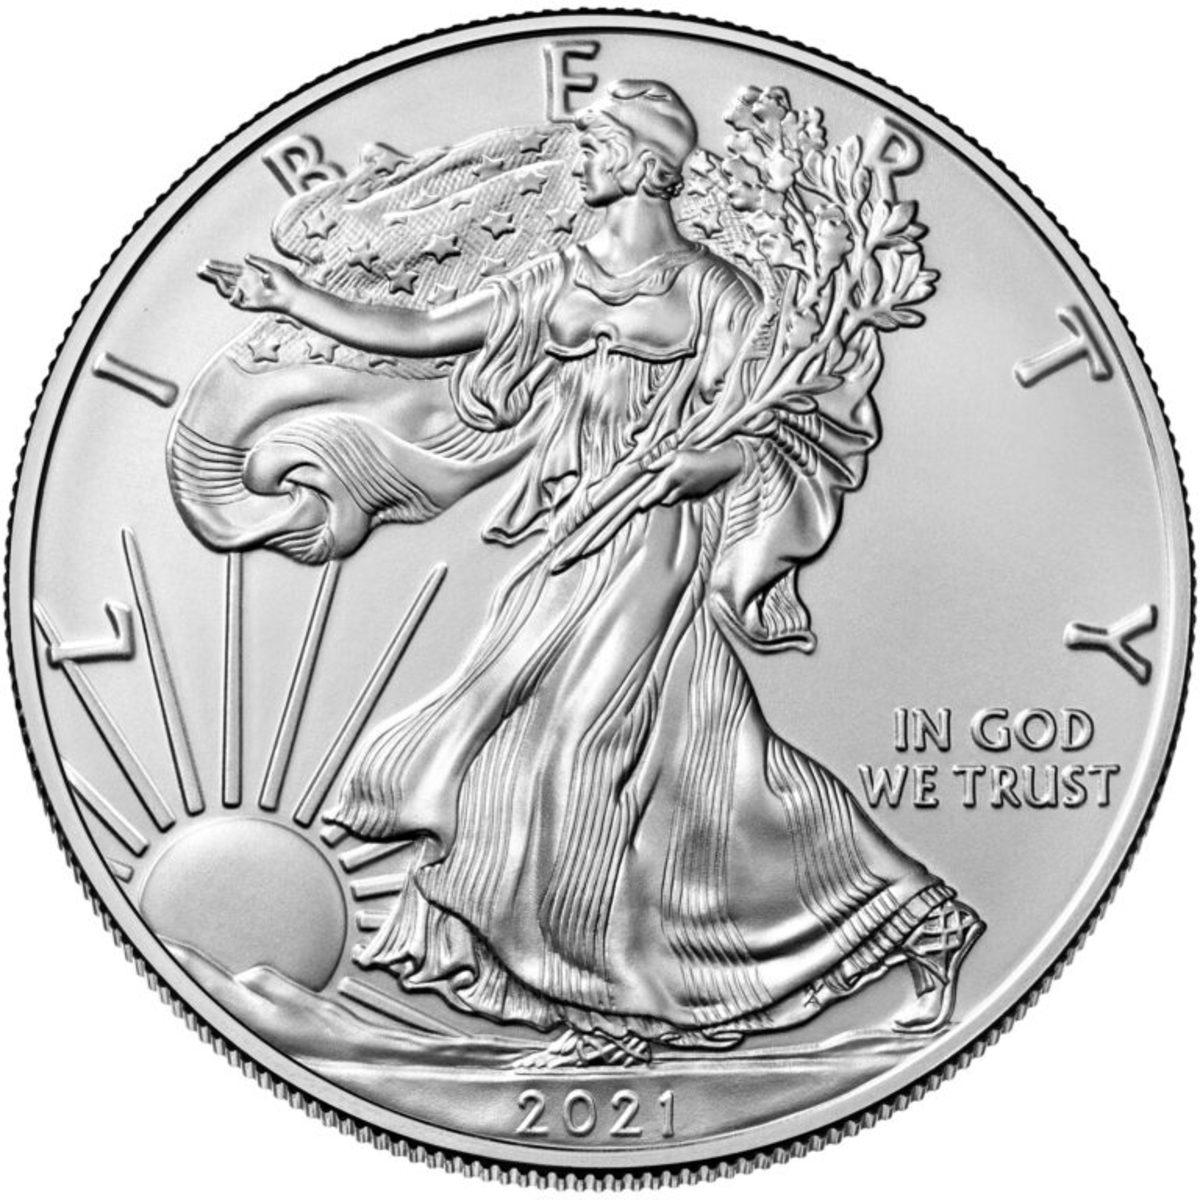 2021 American Eagle silver bullion coin. (Image courtesy U.S. Mint.)